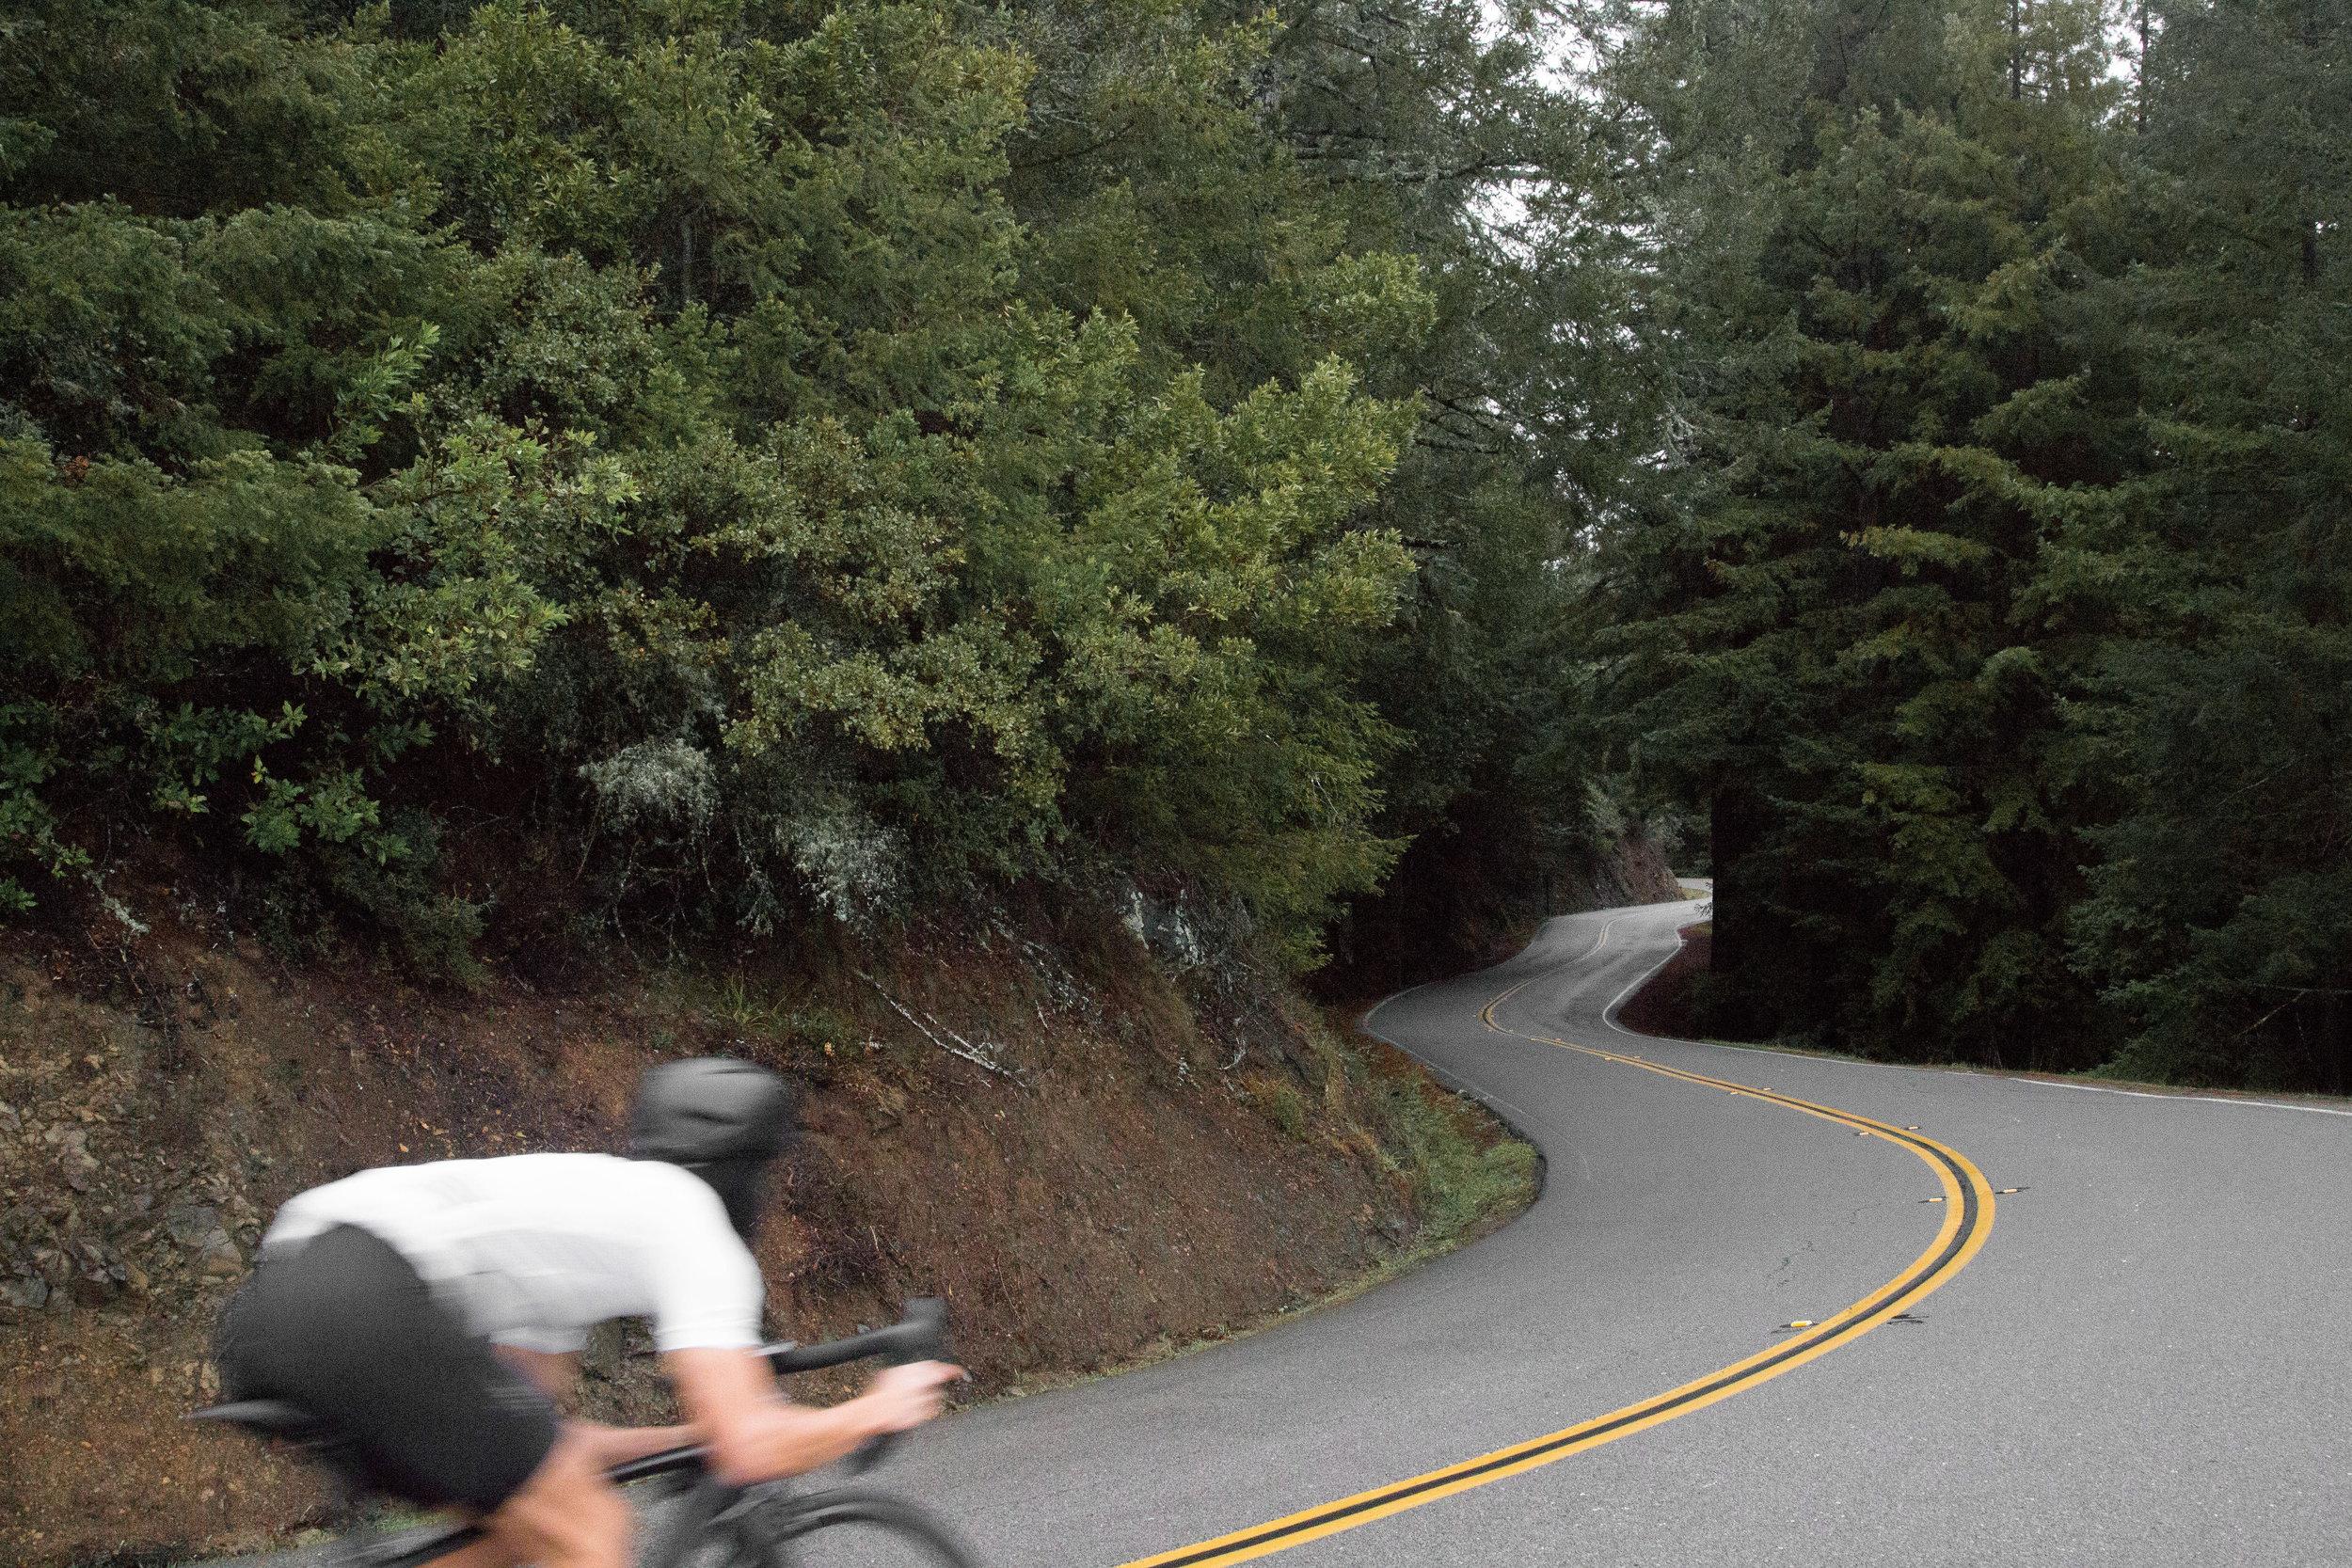 The author riding down Mt. Tamalpais.